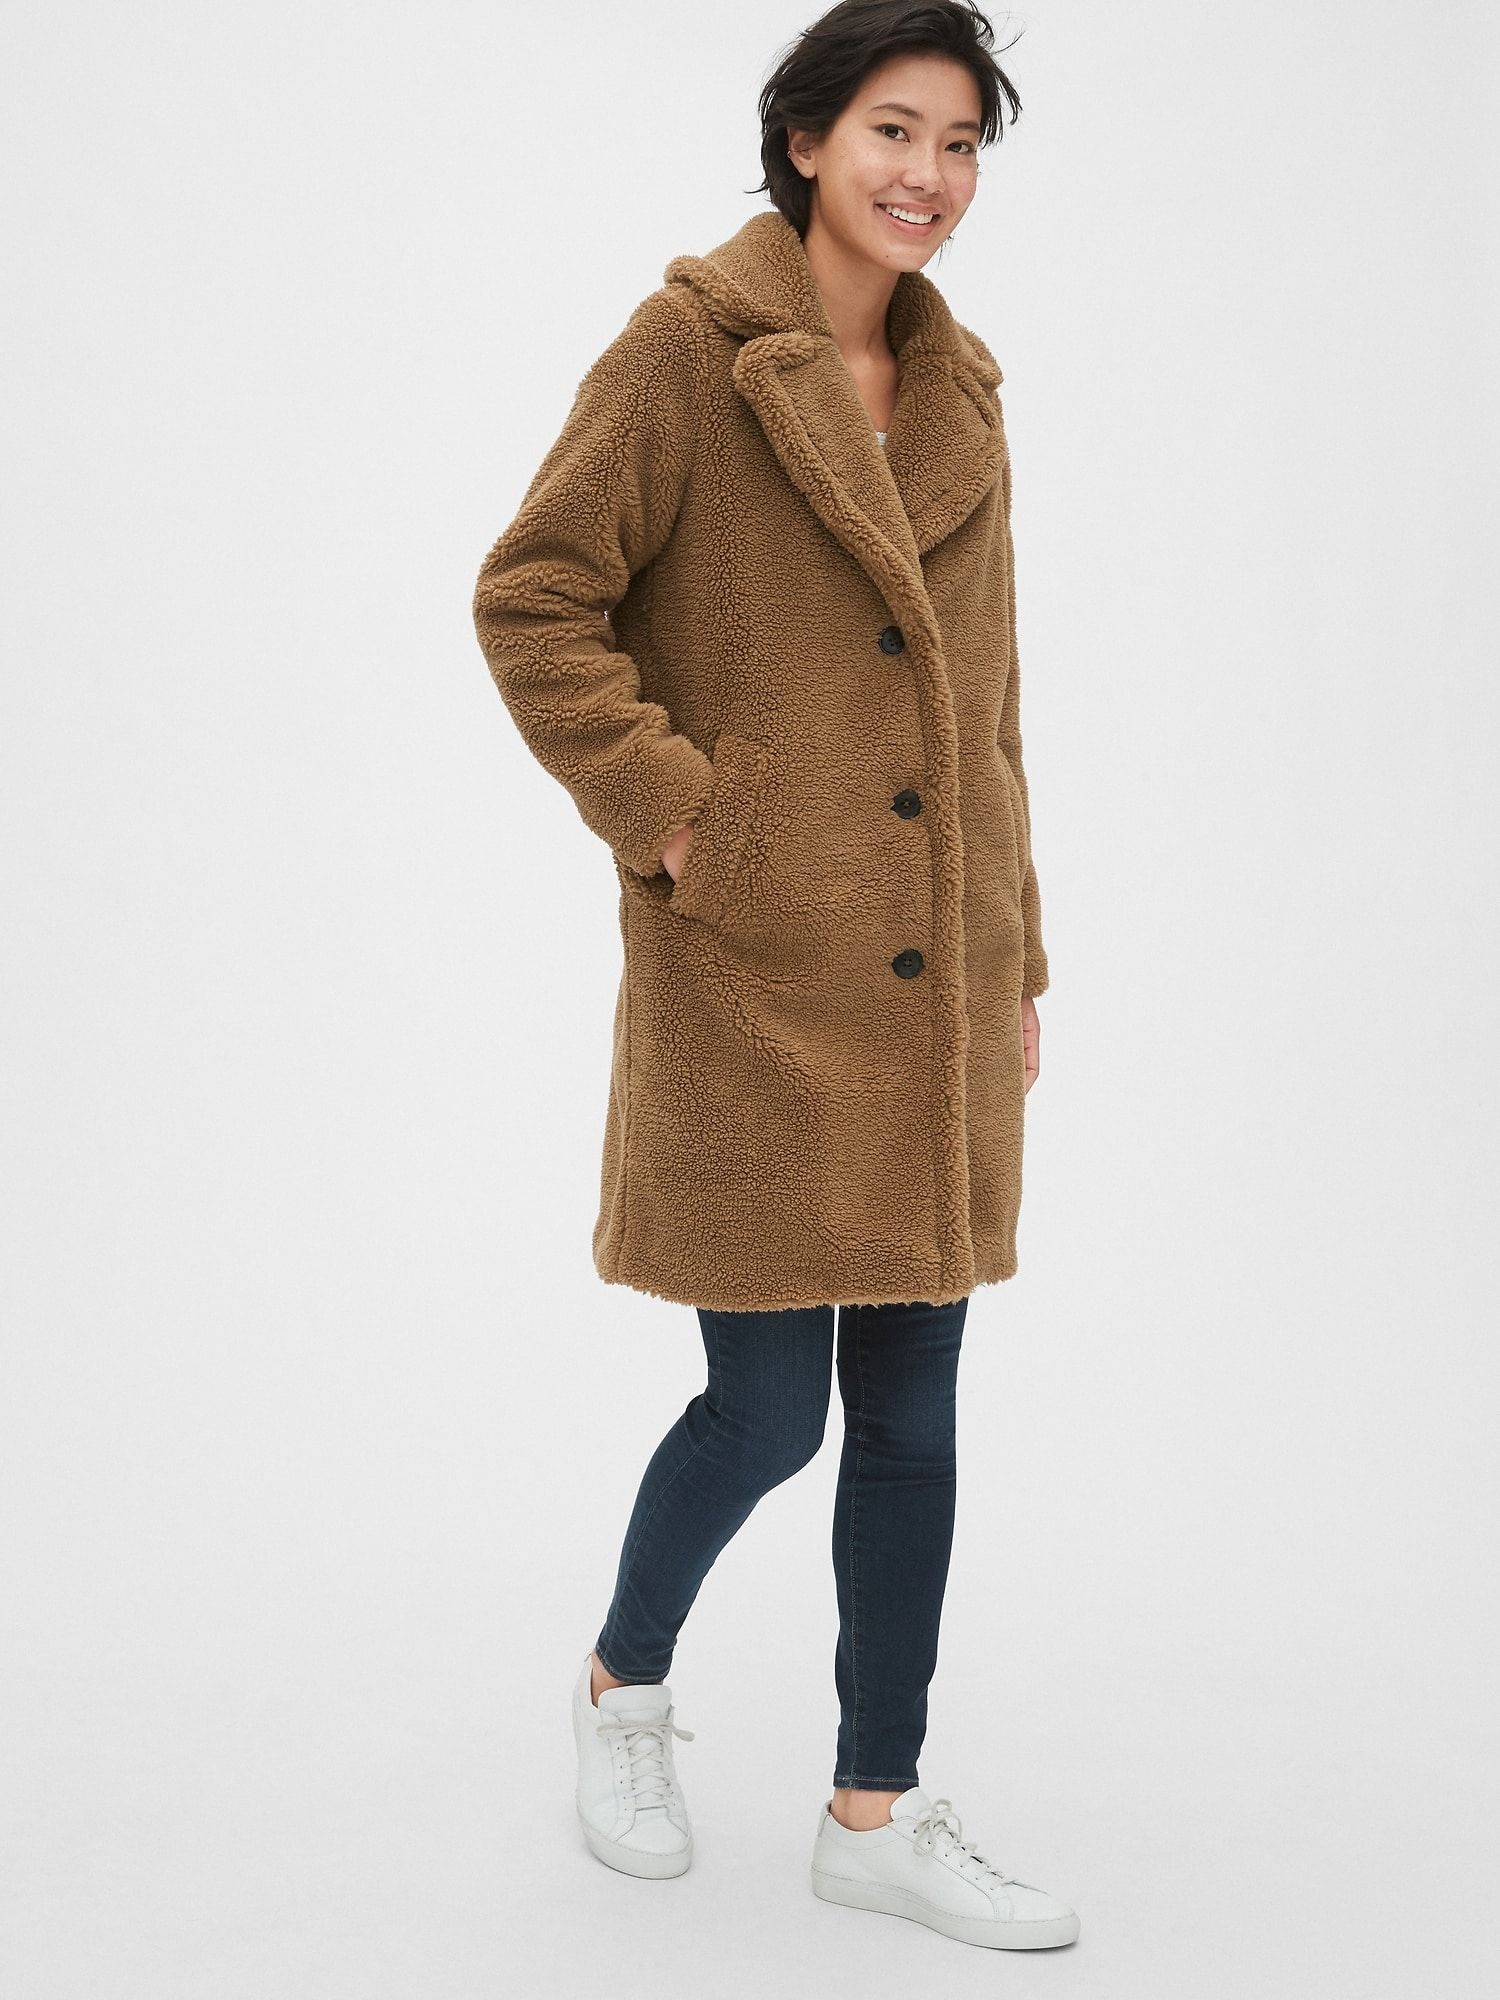 Teddy Coat Gap Teddy Coat Womens Active Wear Outfits Coat [ 2000 x 1500 Pixel ]